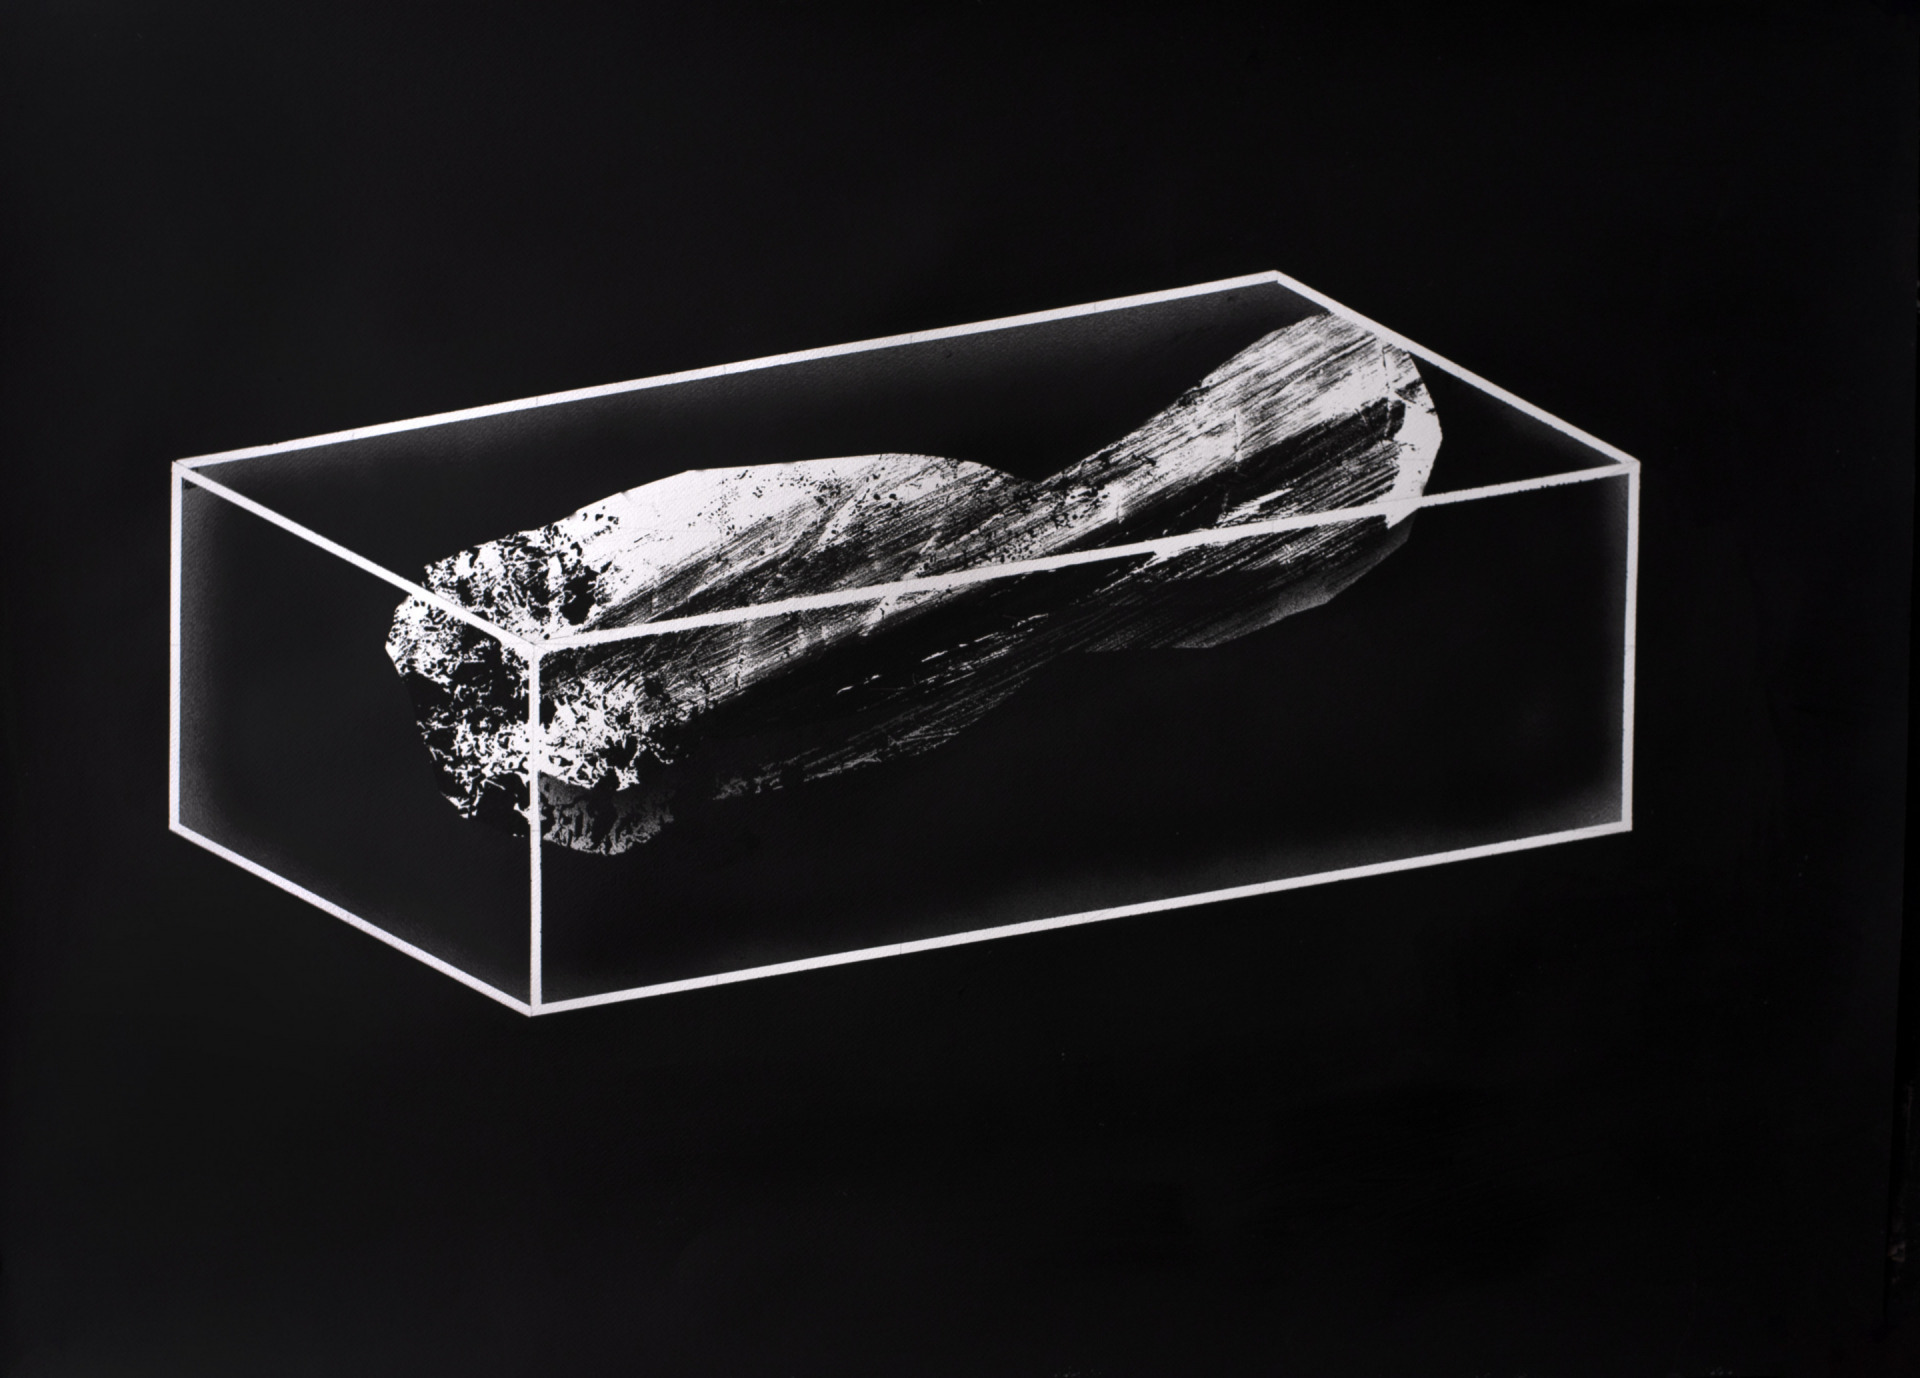 Contemporary art from Gyula Sági | op200321. 9